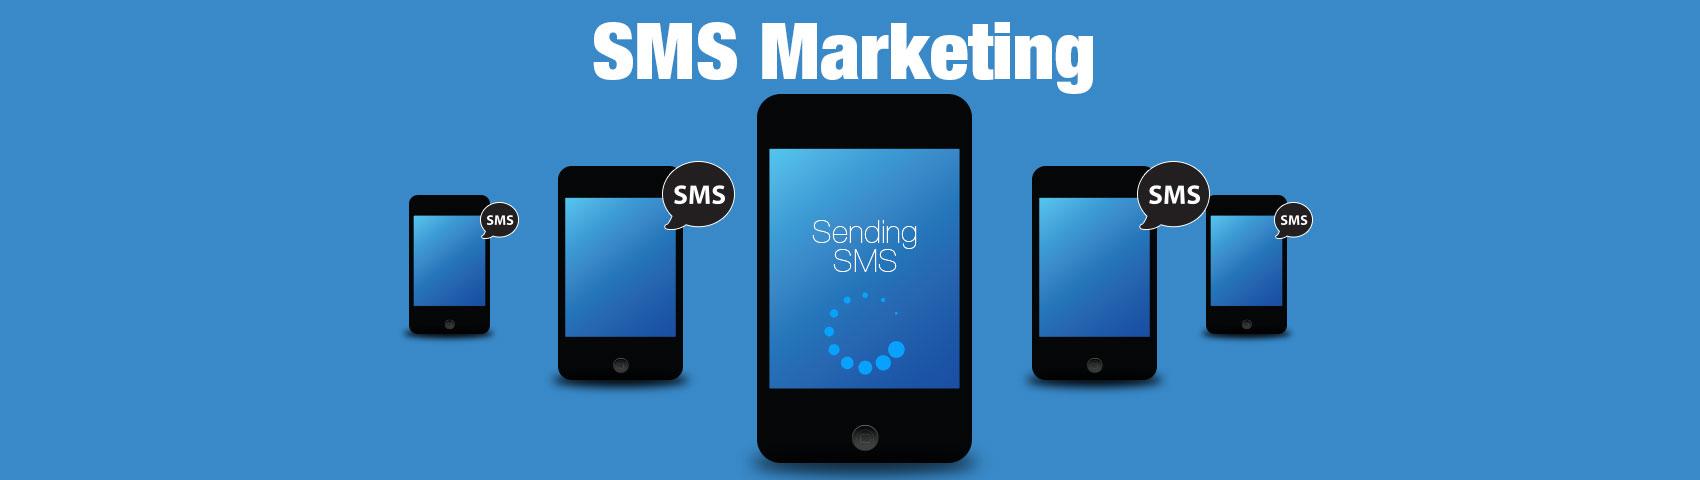 Best SMS Marketing Services Companies Mumbai Bulk WhatsApp Text Agency in Navi Mumbai Thane India Mint Media